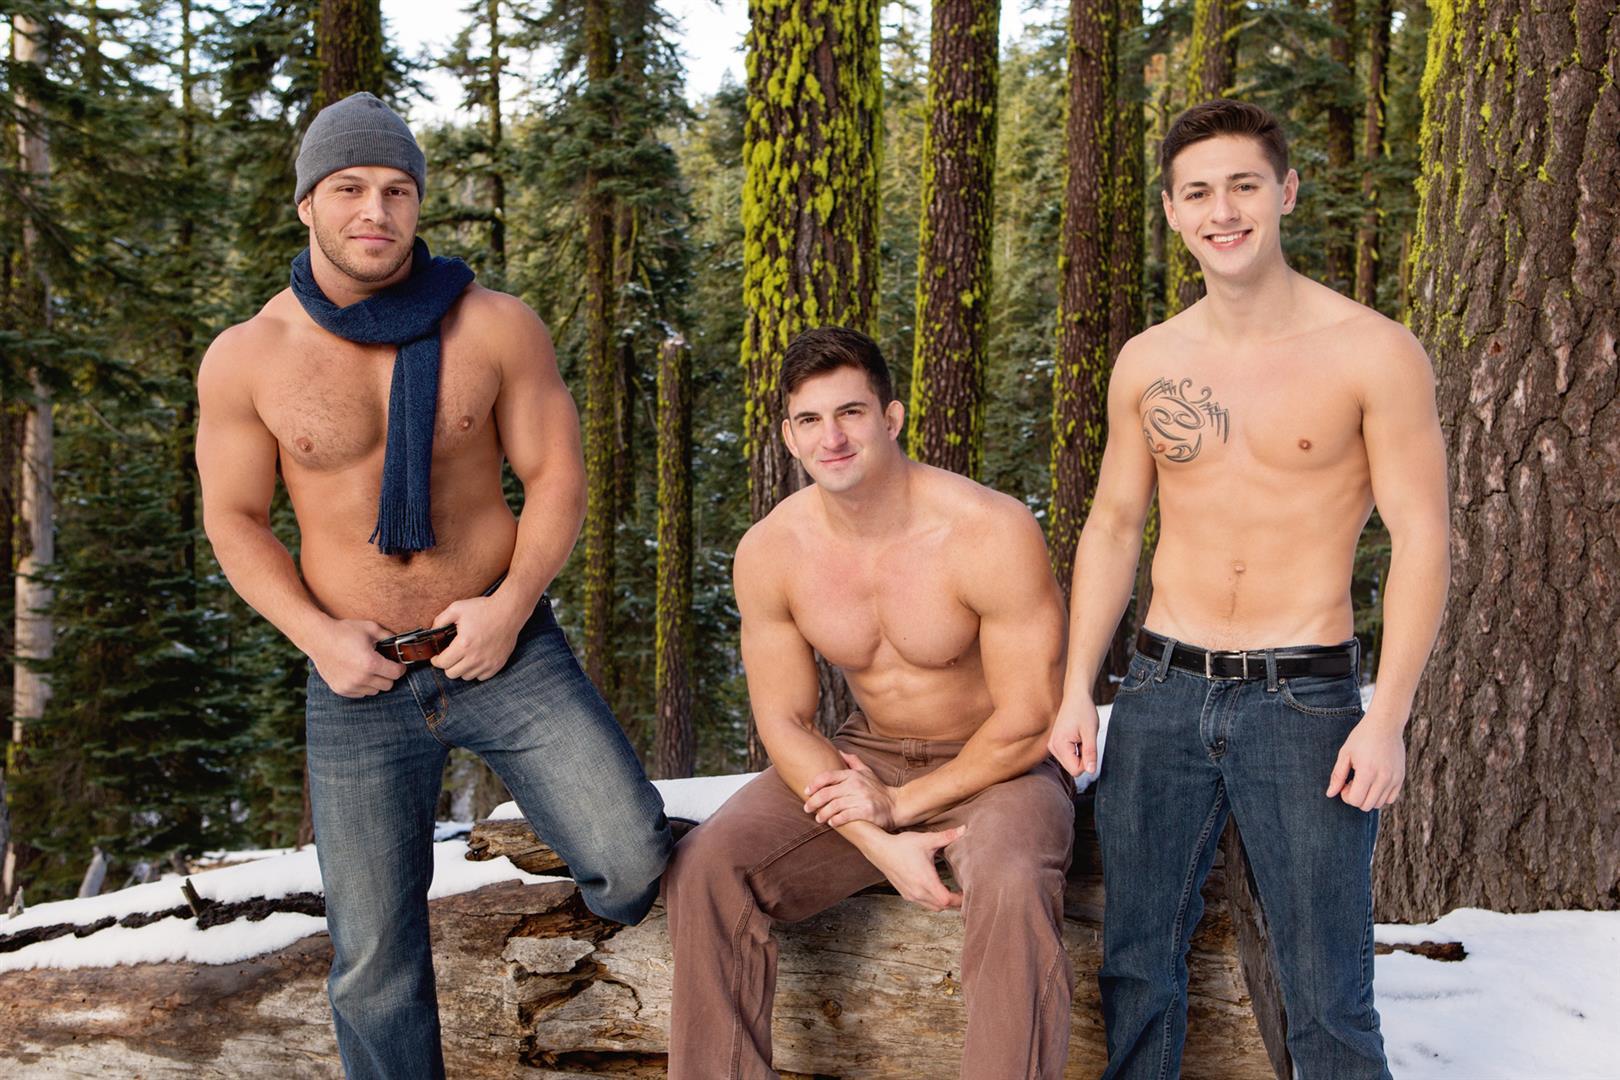 Sean-Cody-Winter-Getaway-Day-2-Big-Dick-Hunks-Fucking-Bareback-Amateur-Gay-Porn-10 Sean Cody Takes The Boys On A 8-Day Bareback Winter Getaway